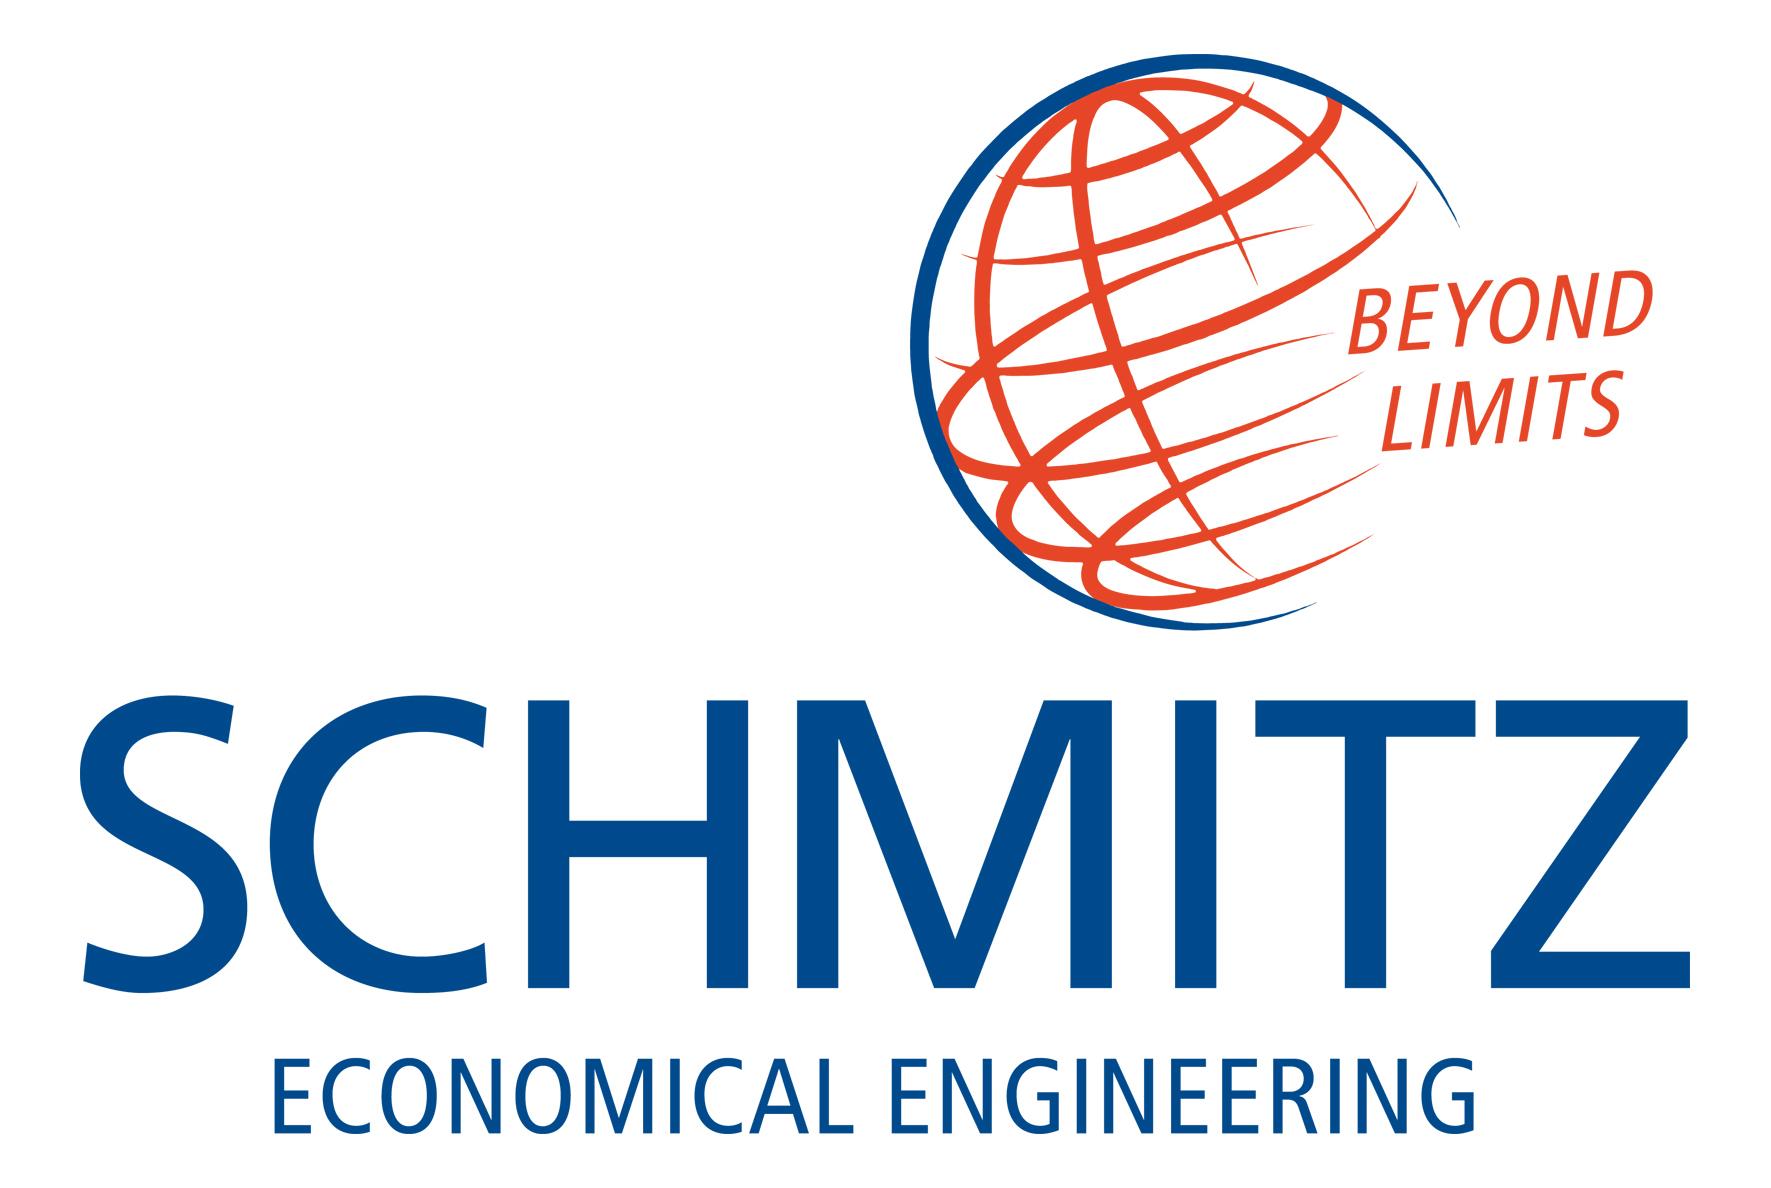 Schmitz GmbH